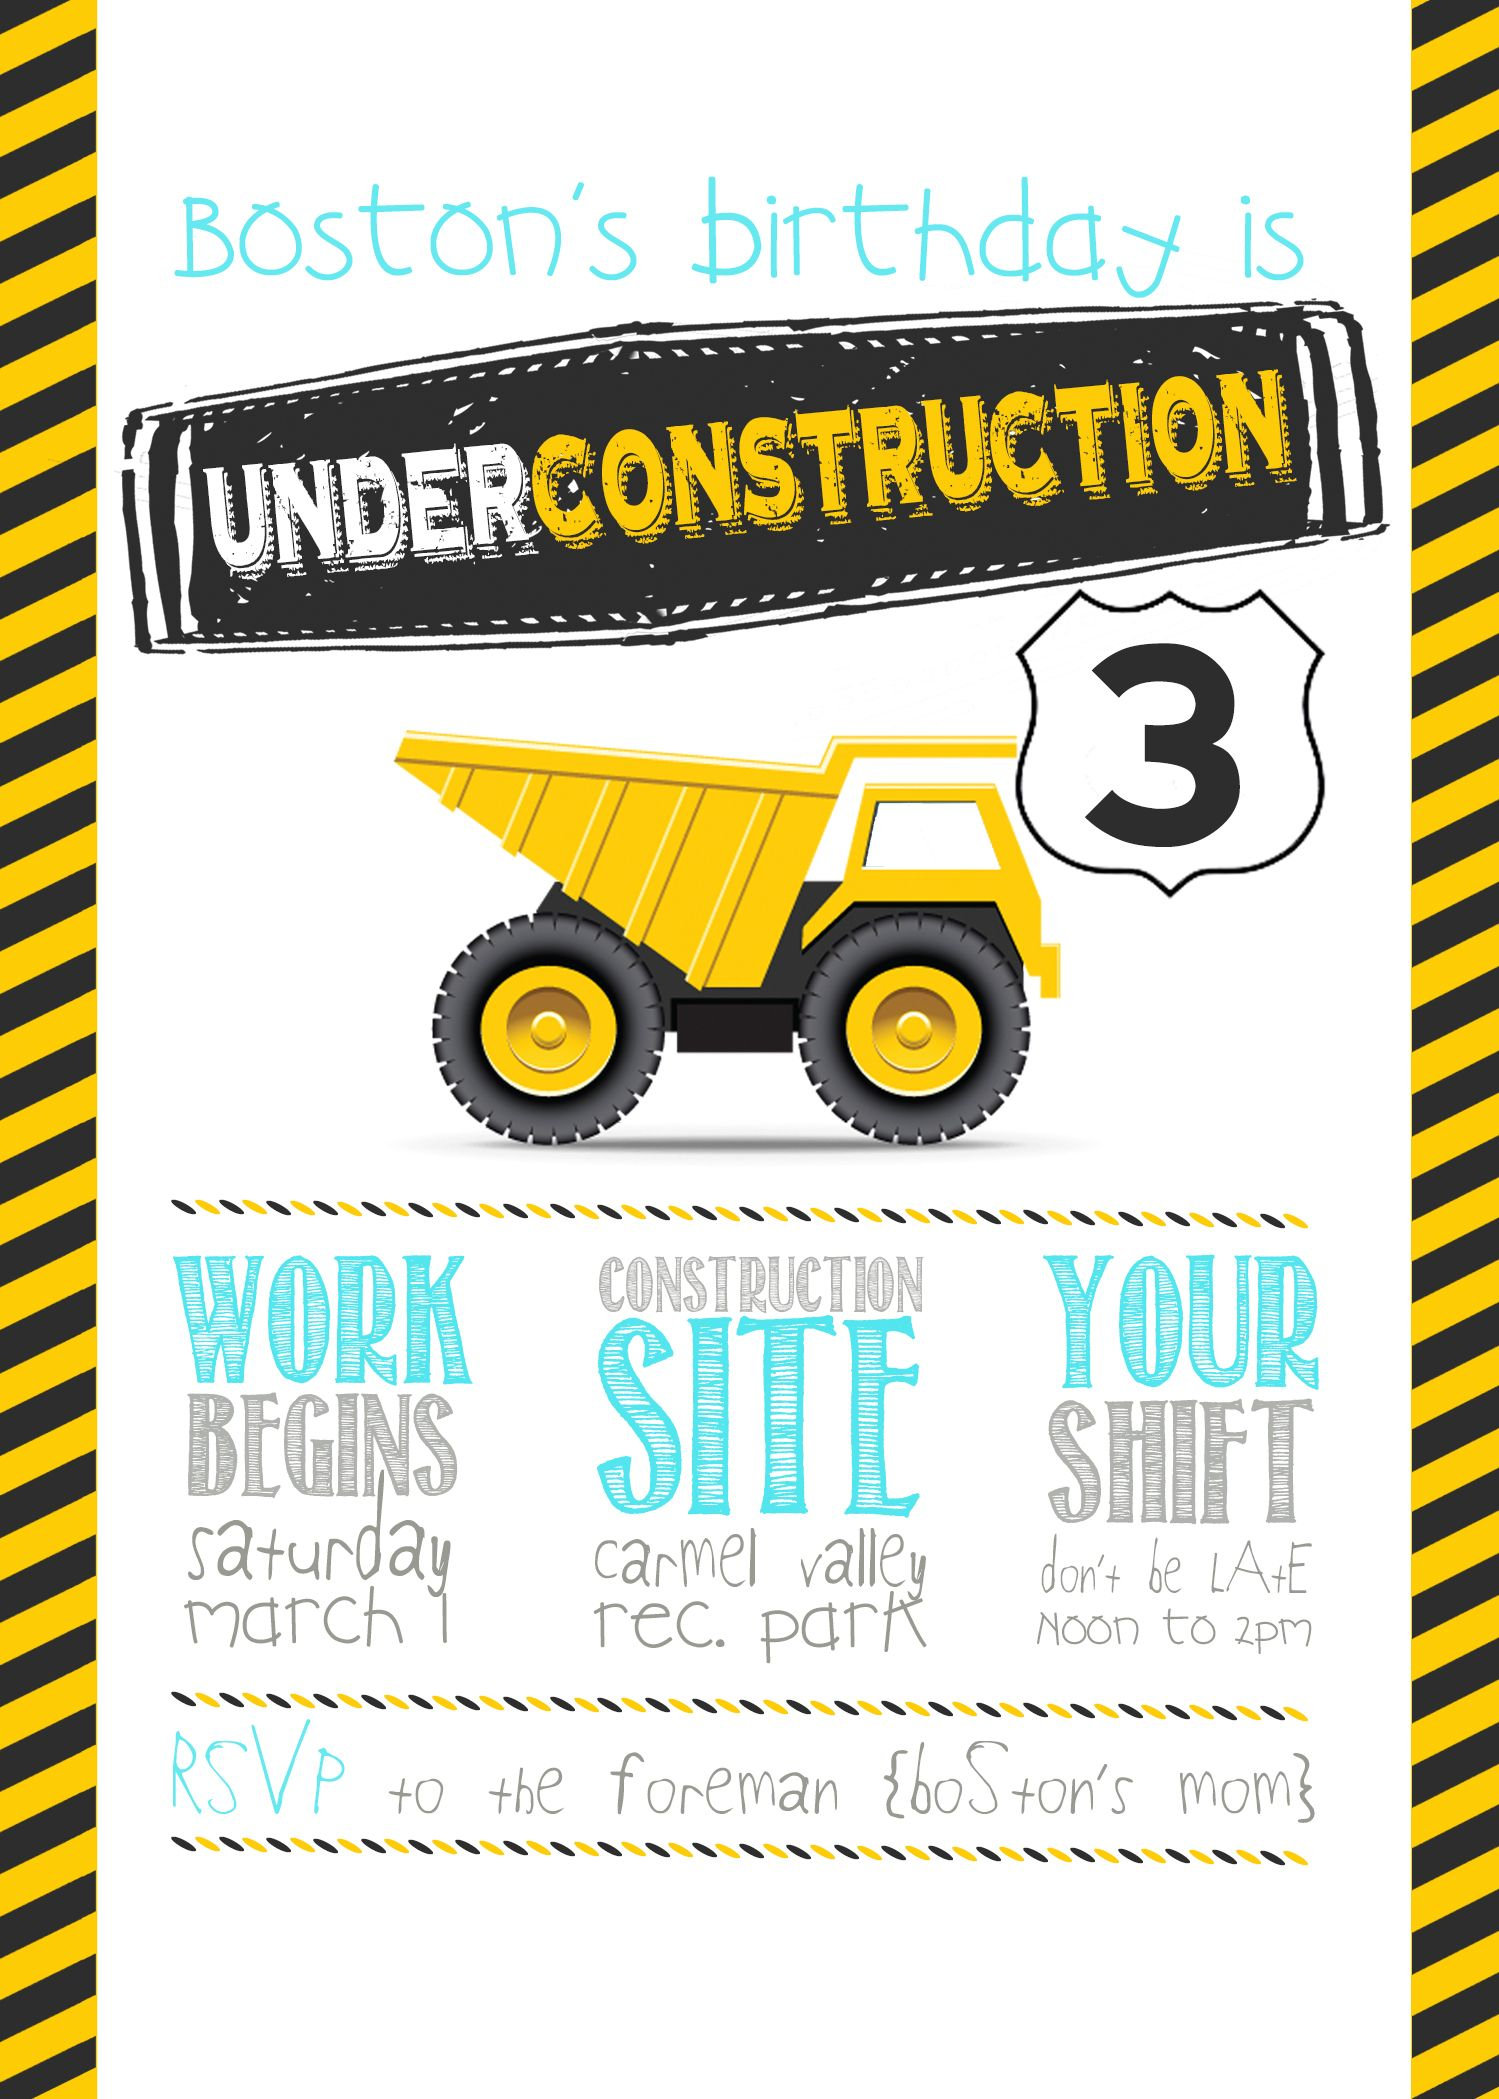 13 construction party invites ideas